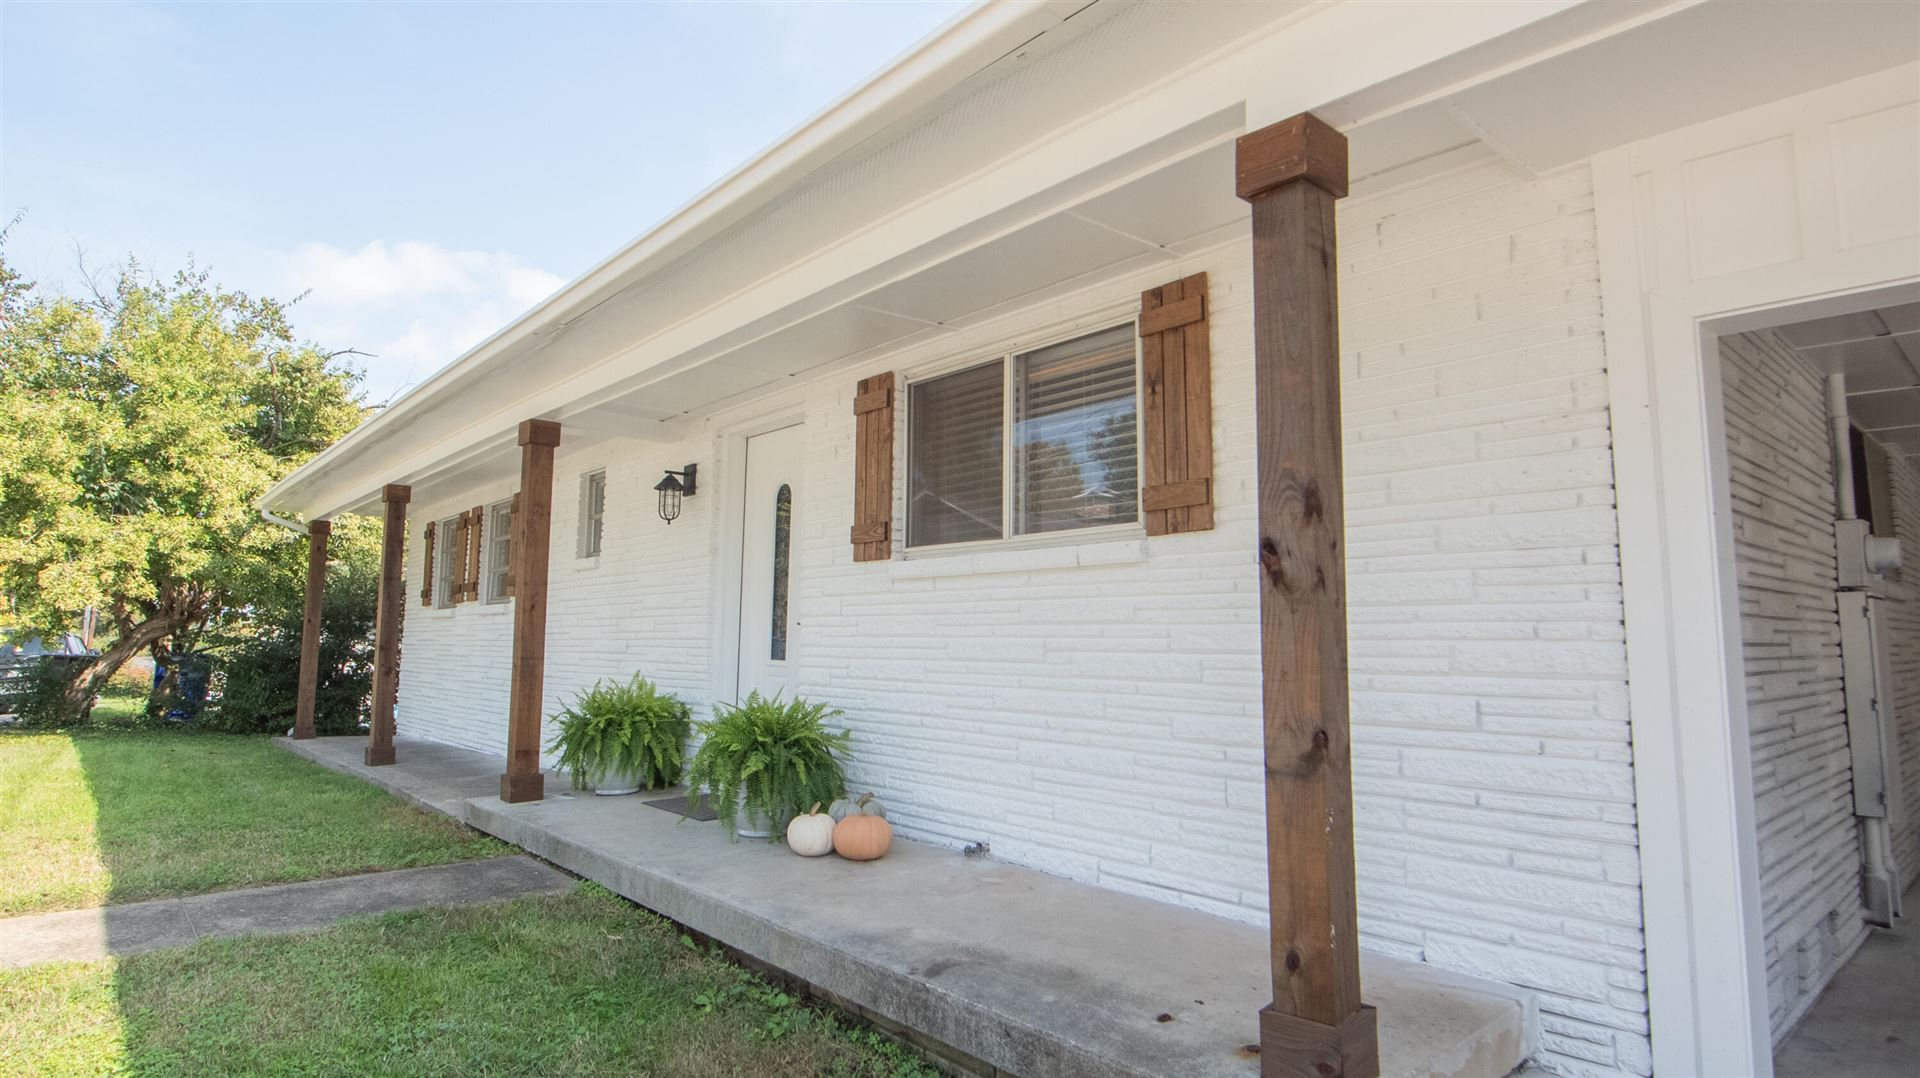 Photo of 104 E Magnolia Ln Lane, Oak Ridge, TN 37830 (MLS # 1170239)